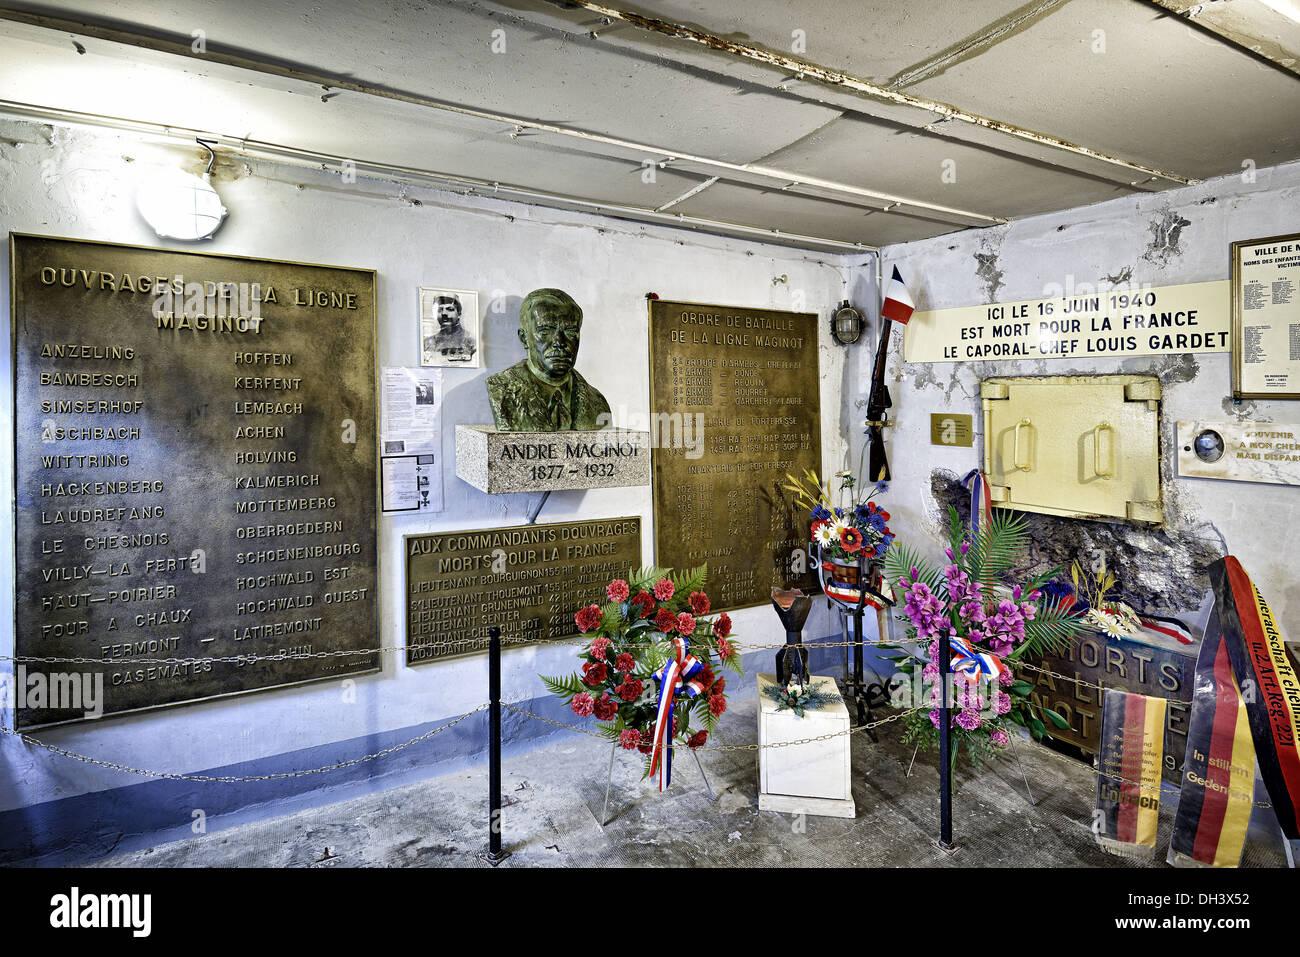 André Maginot Memorial, Marckolsheim bunker, Maginot line. - Stock Image